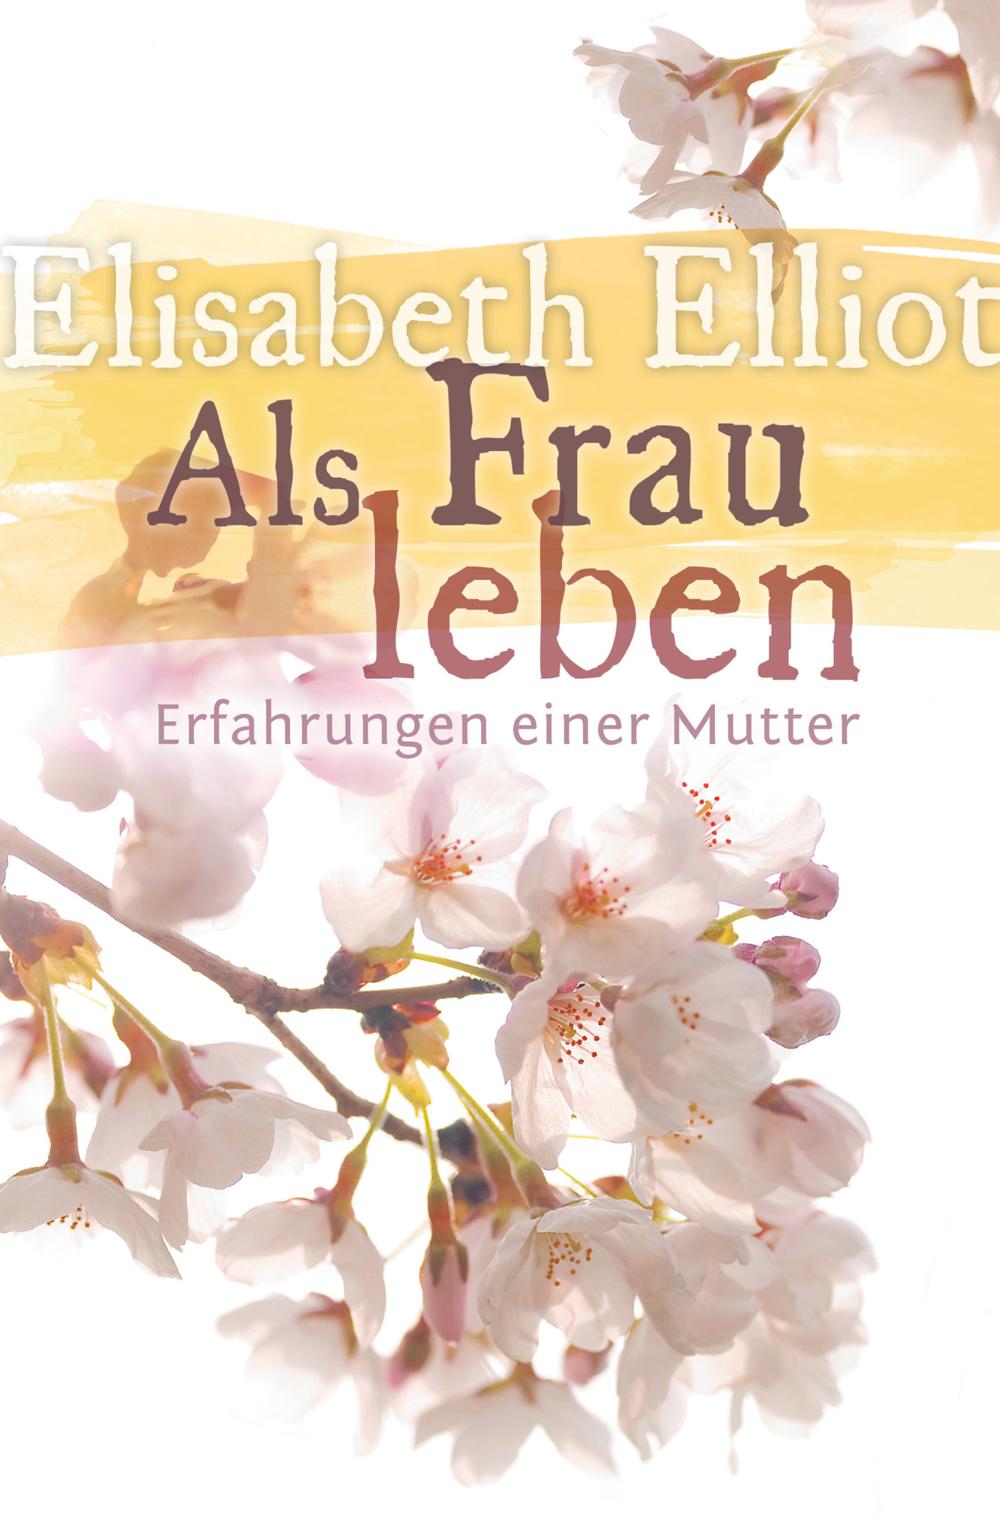 CLV_als-frau-leben_elisabeth-elliot_256230_1